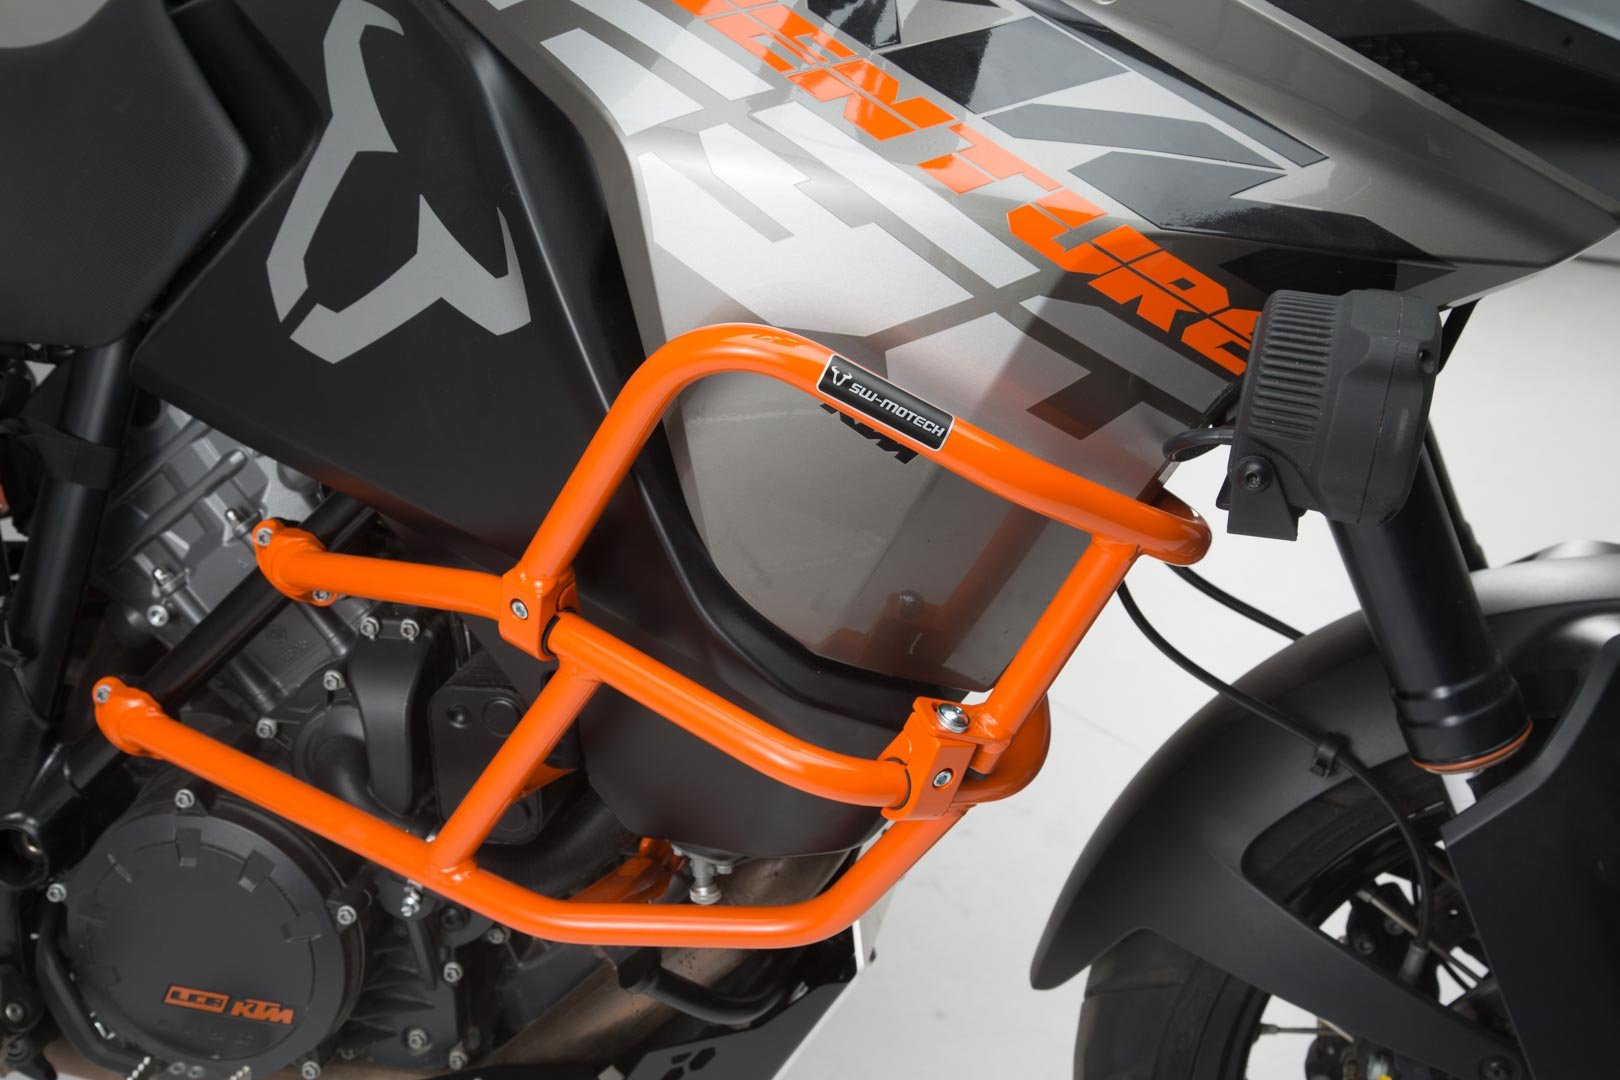 SW-Motech upper crash bar for orig. KTM crash bar (orange) 1290 SAdv R / S (16-), 1090 Adv (16-)